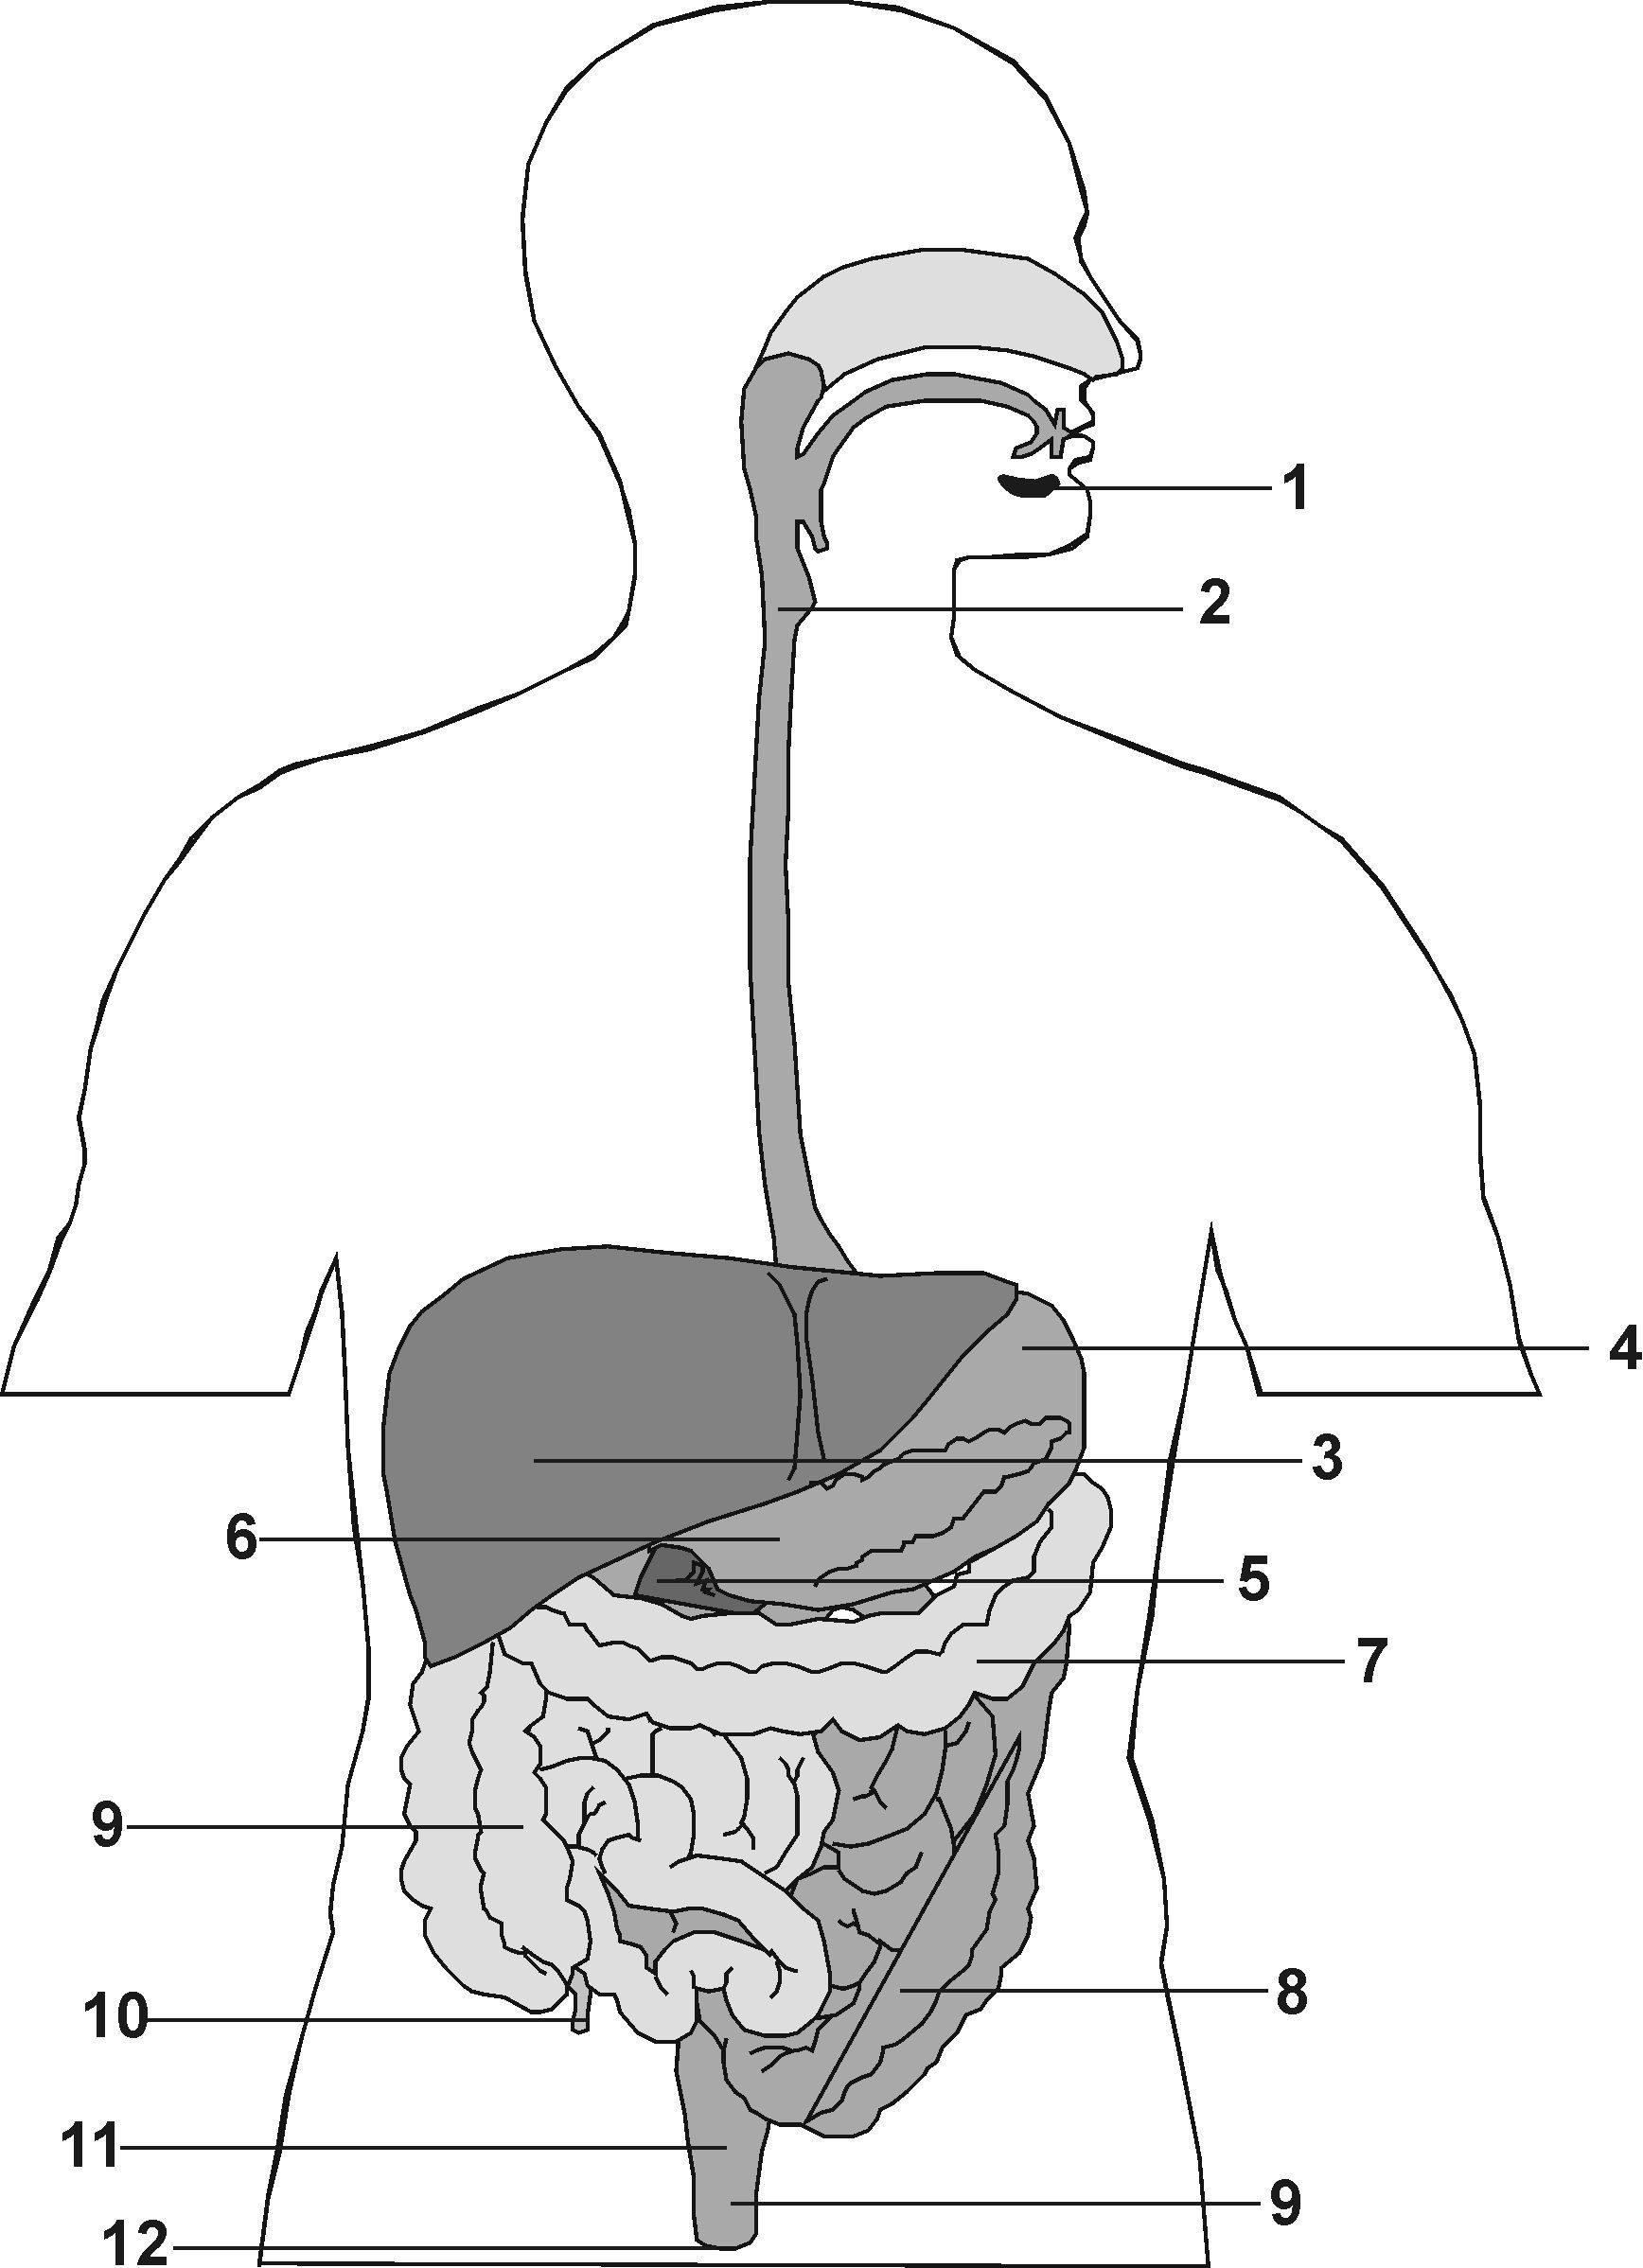 Unlabeled Digestive System Diagram Unlabeled Digestive